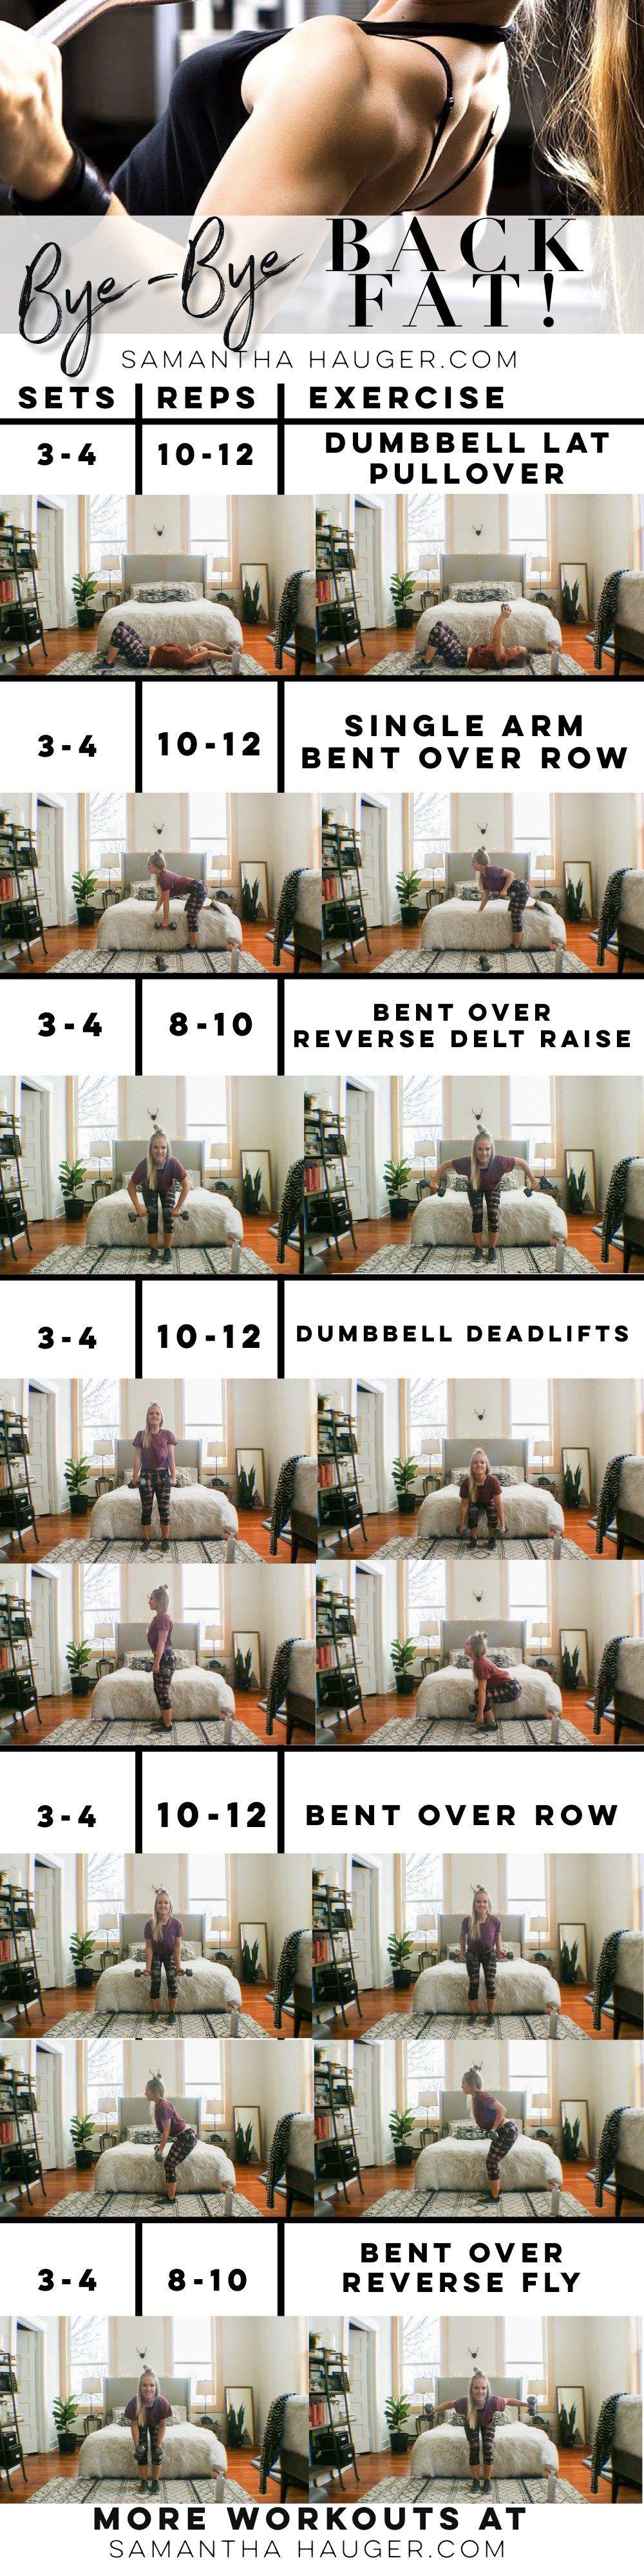 e5b81fa887 How To Get Rid Of Back Fat. How To Lose Back Fat. Exercises for back fat.  Back workout for women. Back exercises. How to lose back fat.